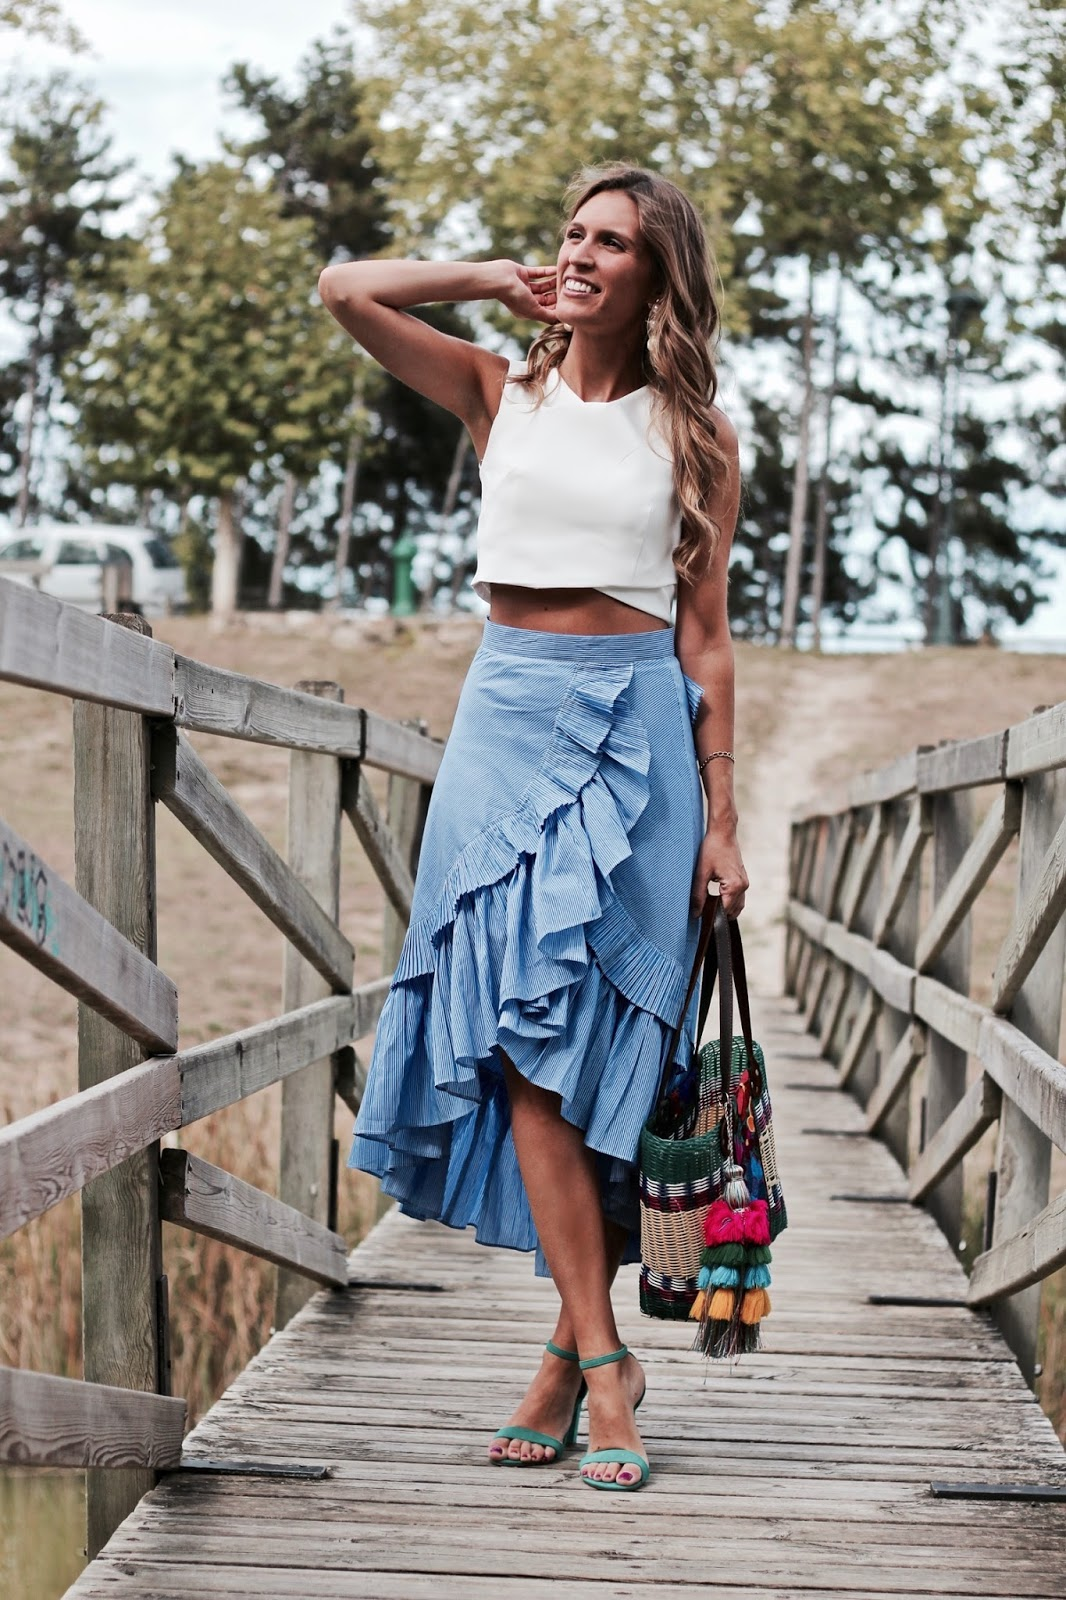 falda rayas azul y blanca